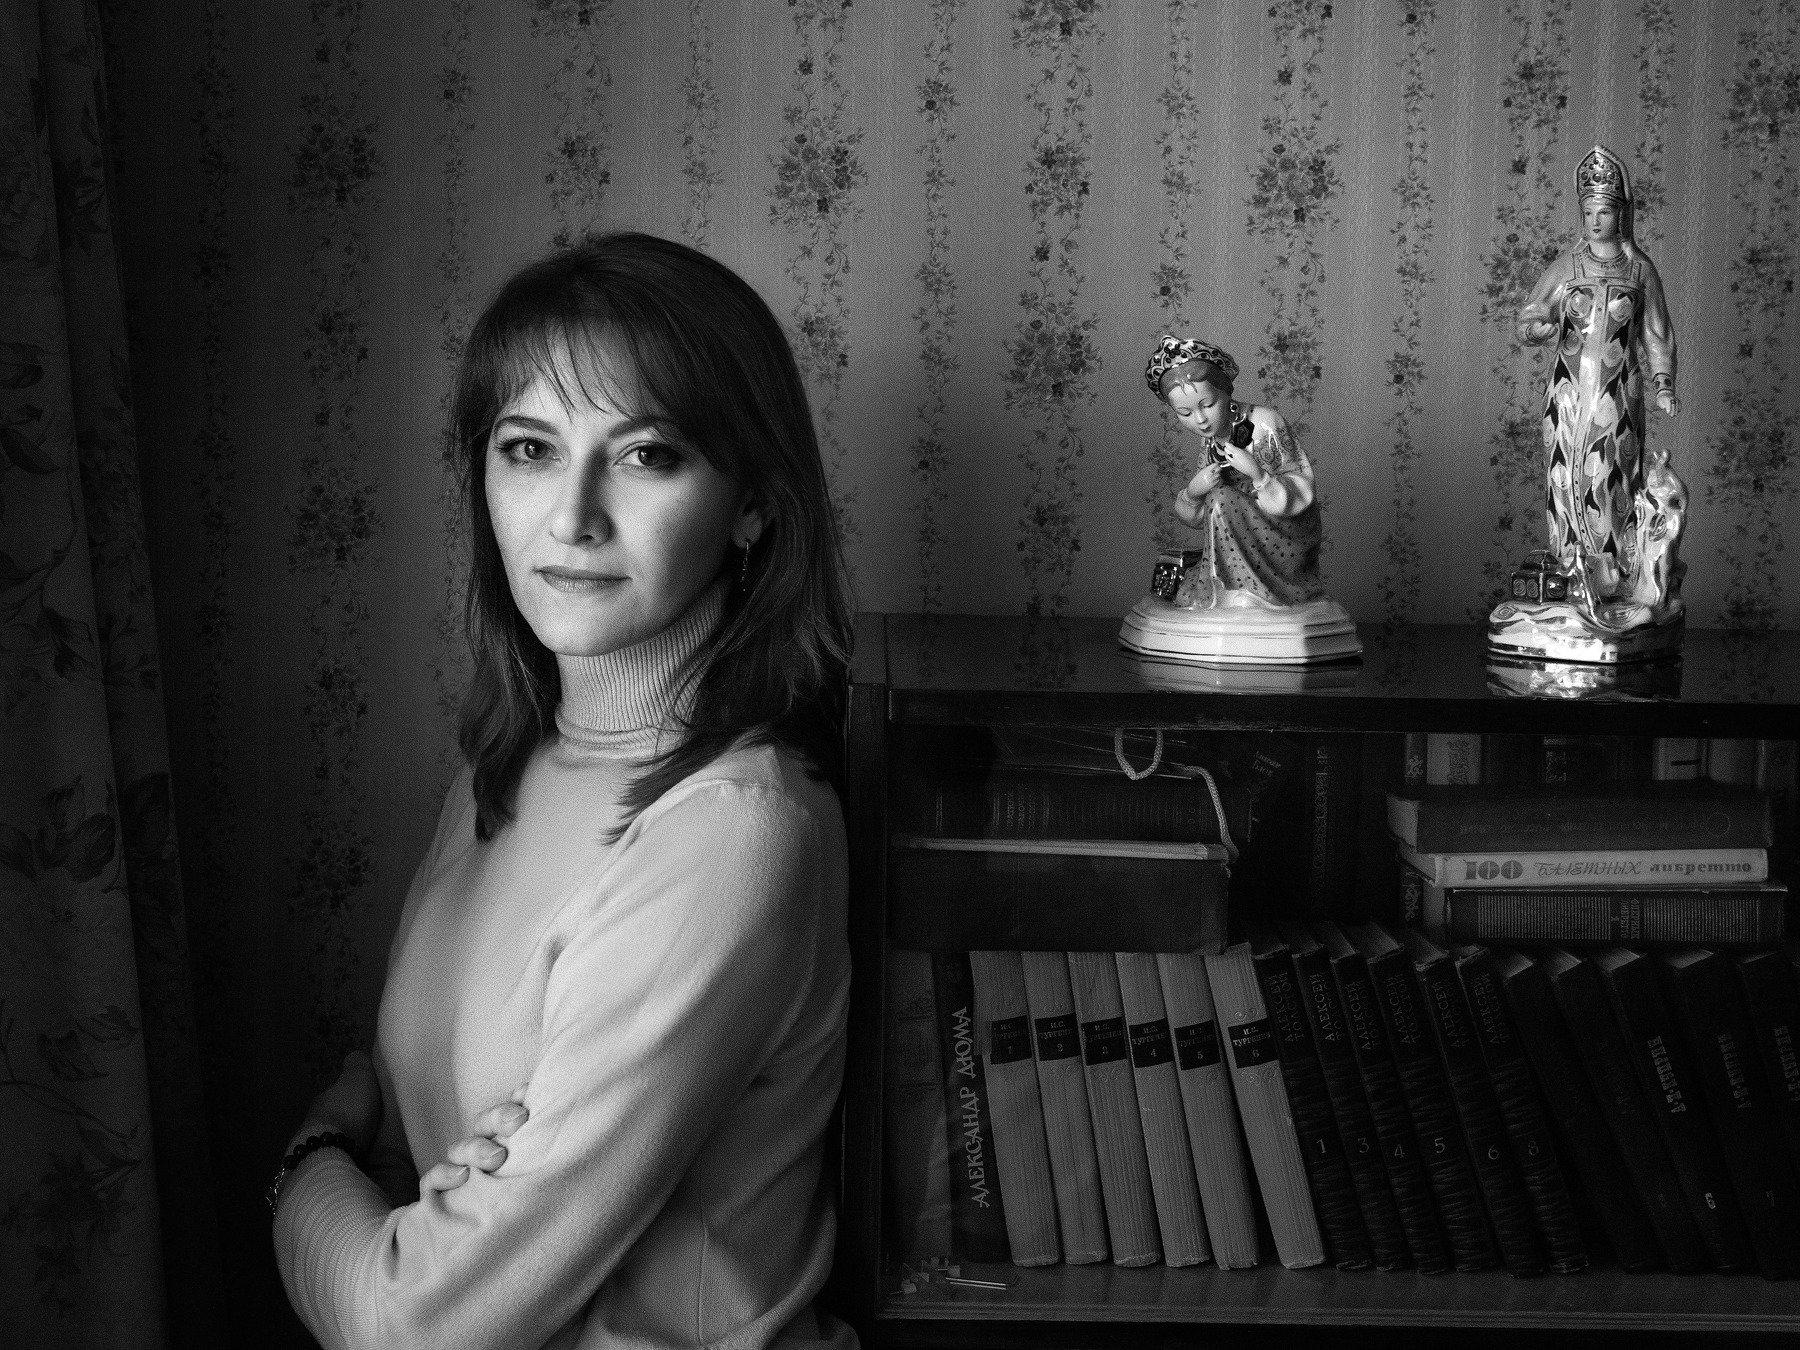 портрет, монохром, девушка, ретро, Алексей Школдин